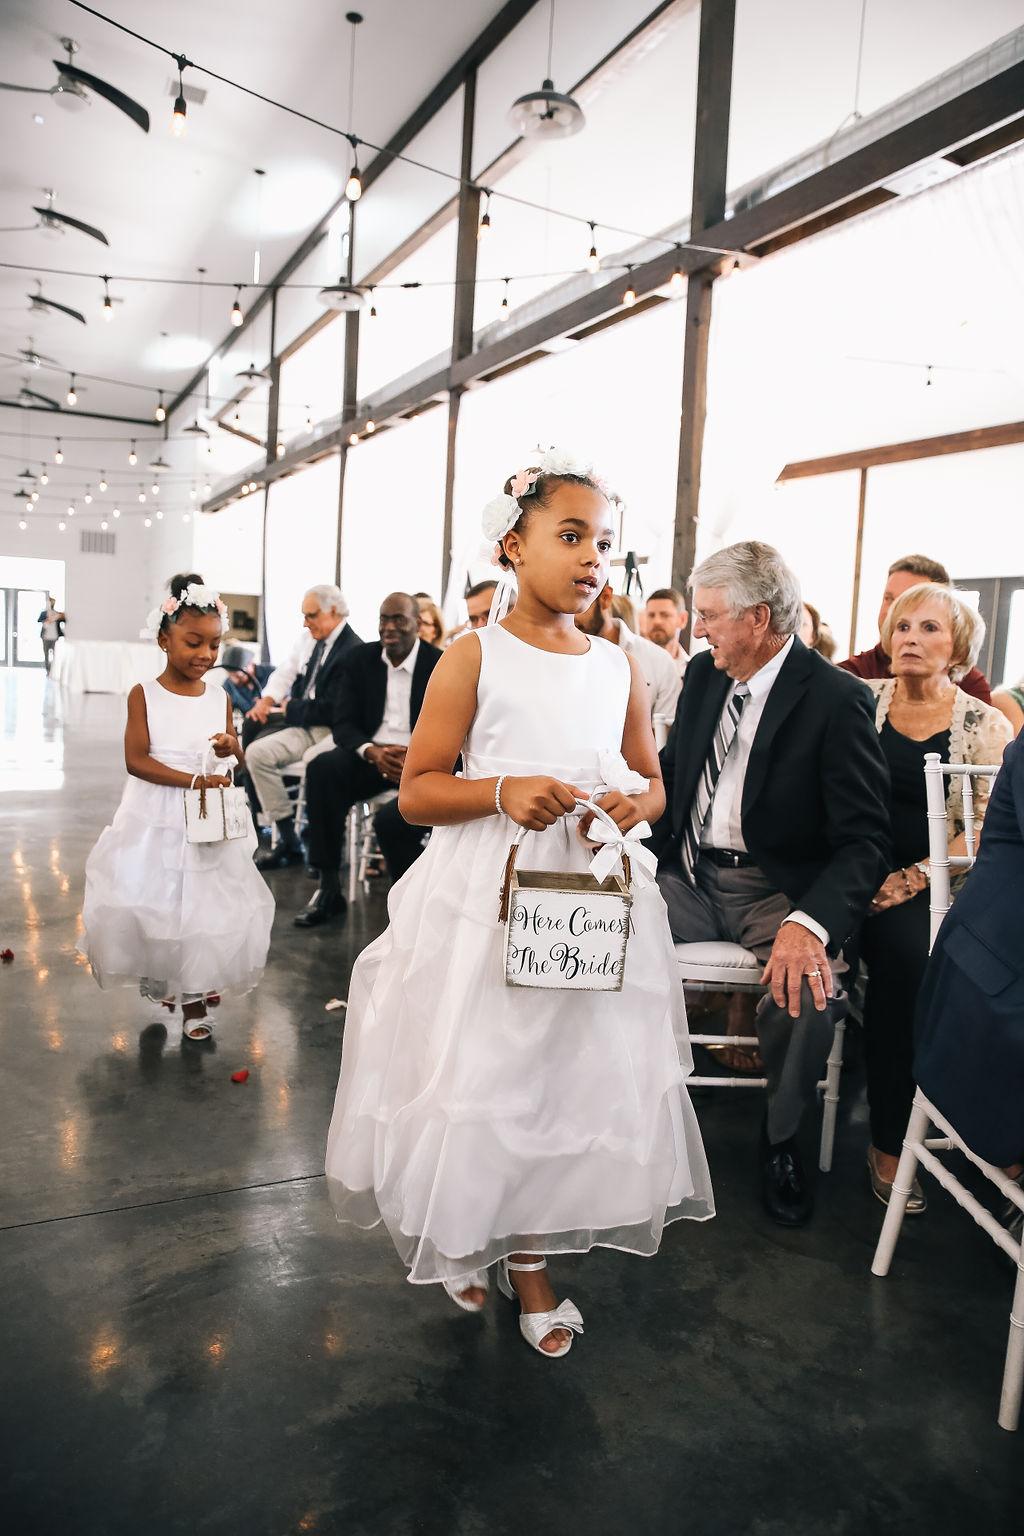 Tulsa Wedding White Barn 38.JPG